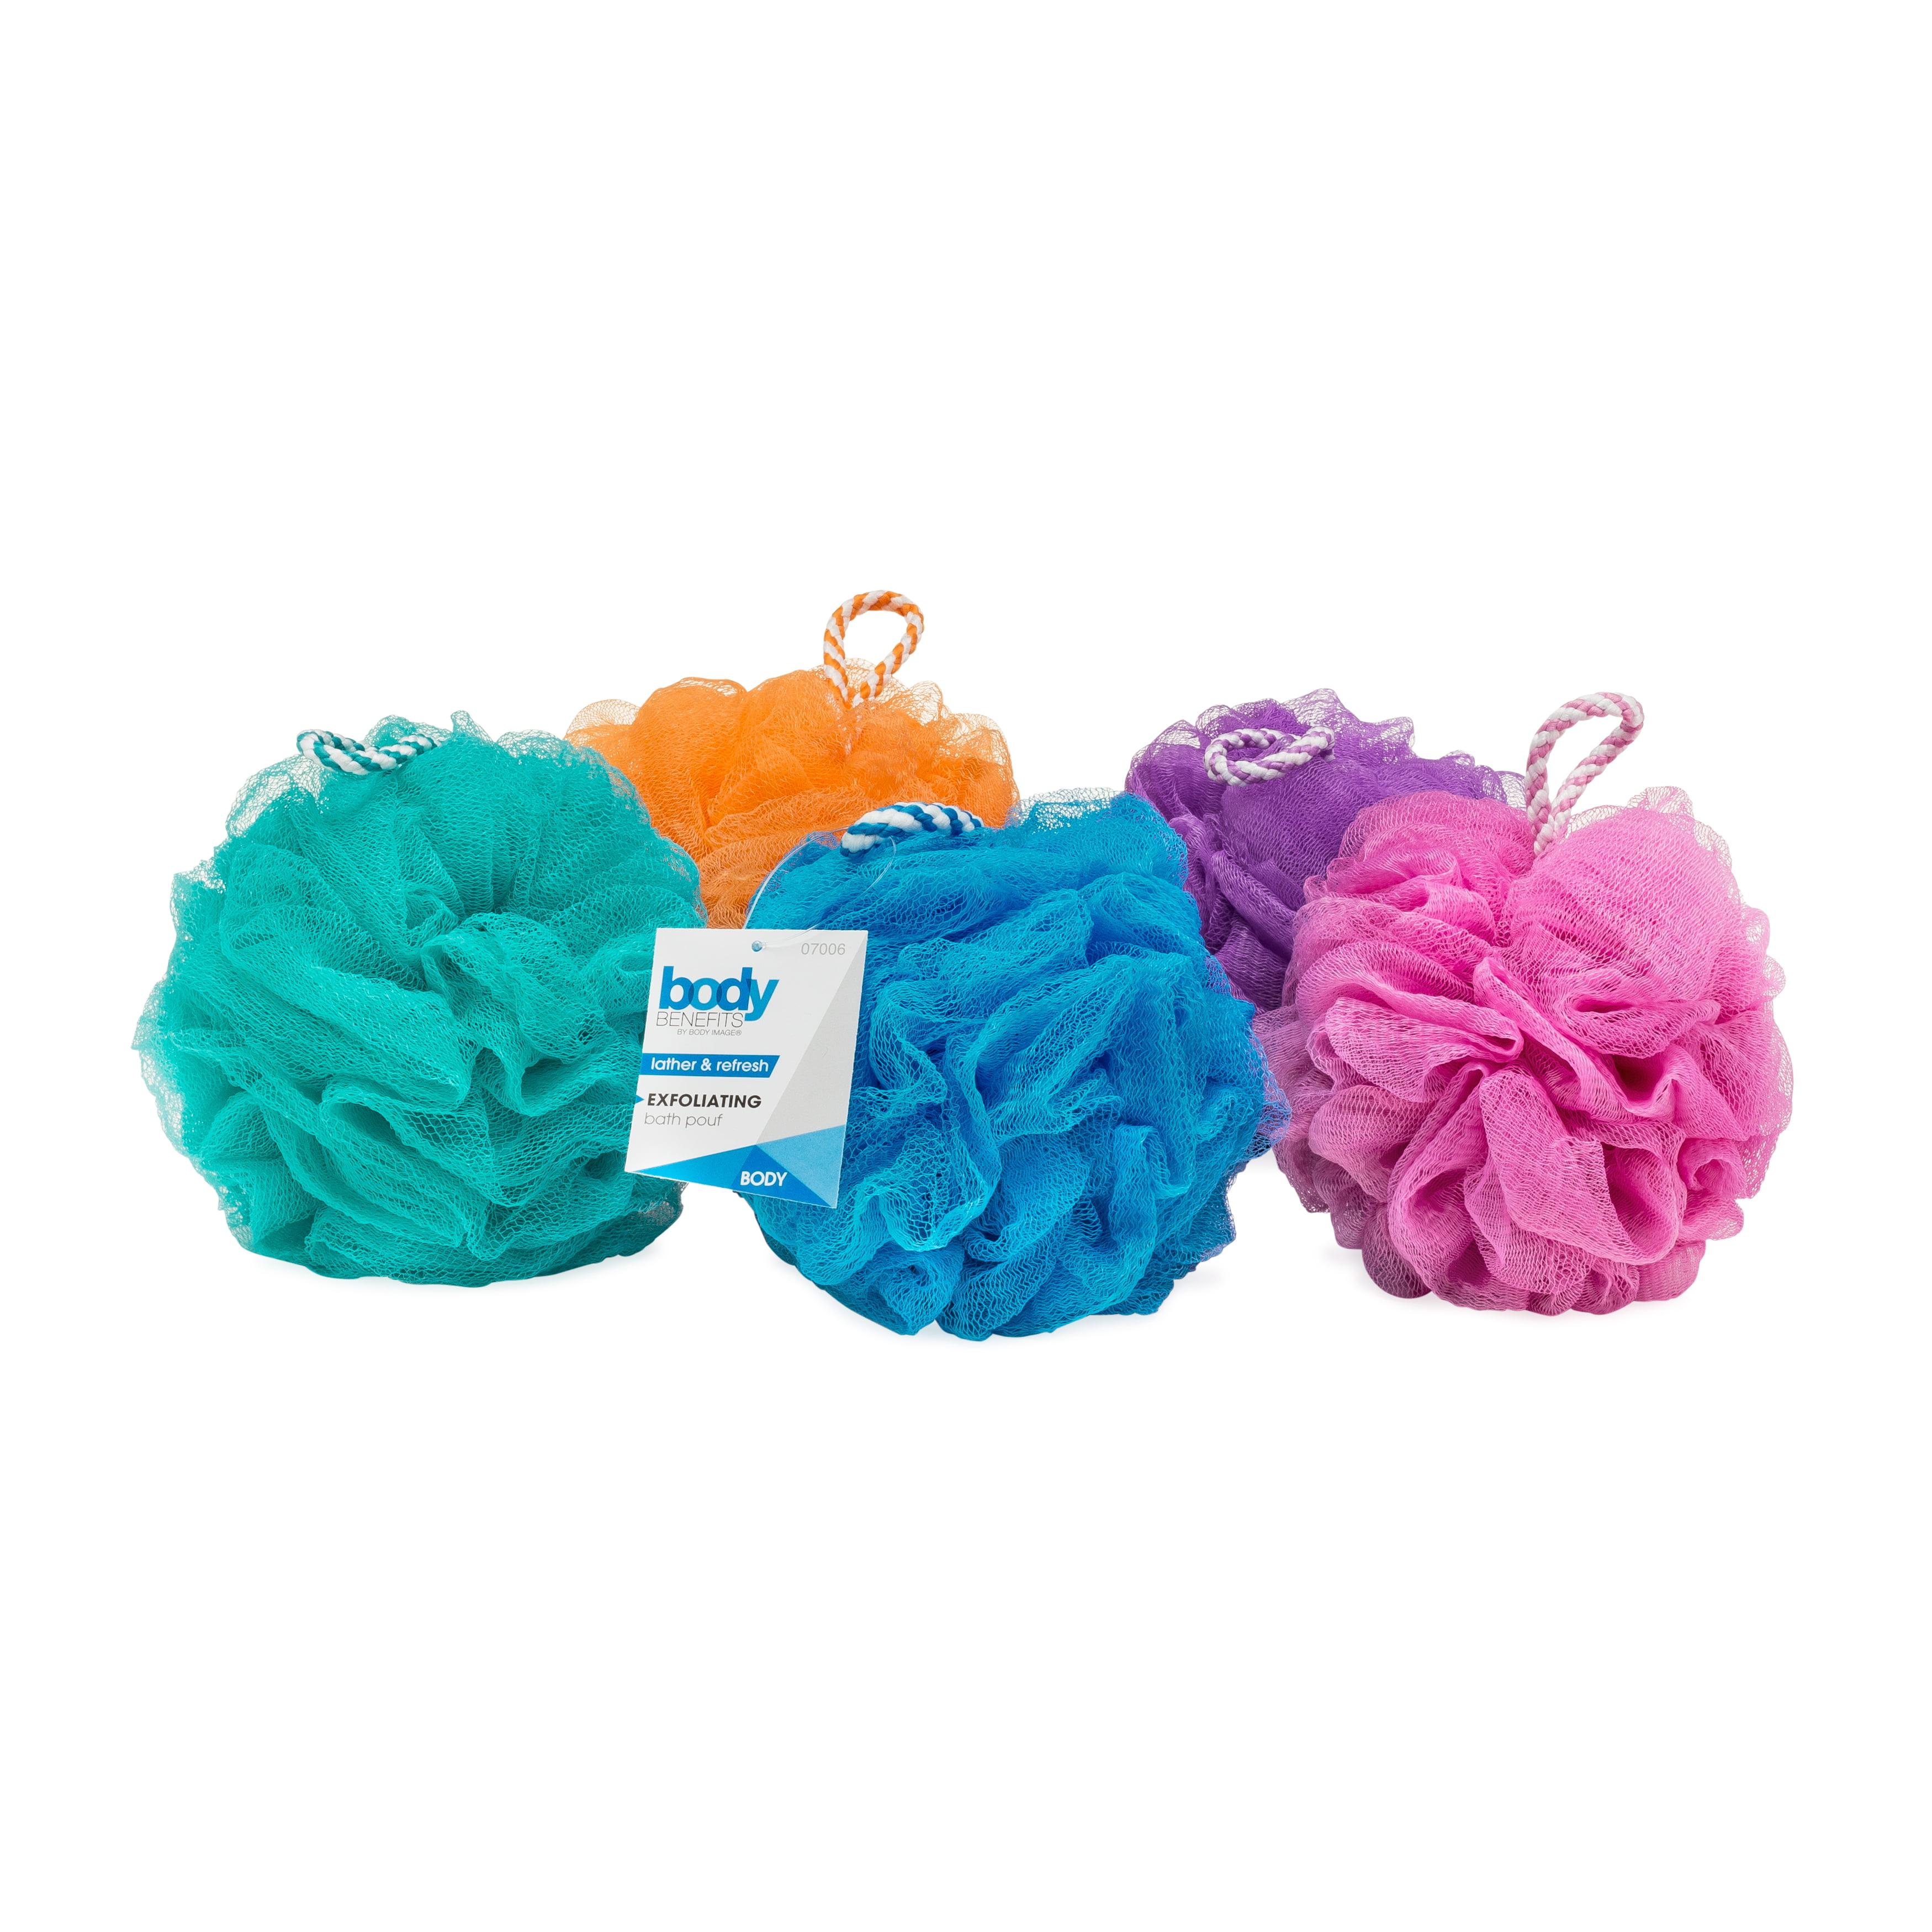 Body Image Body Benefits Exfoliating Bath Sponge, 1 ct, Color May Vary